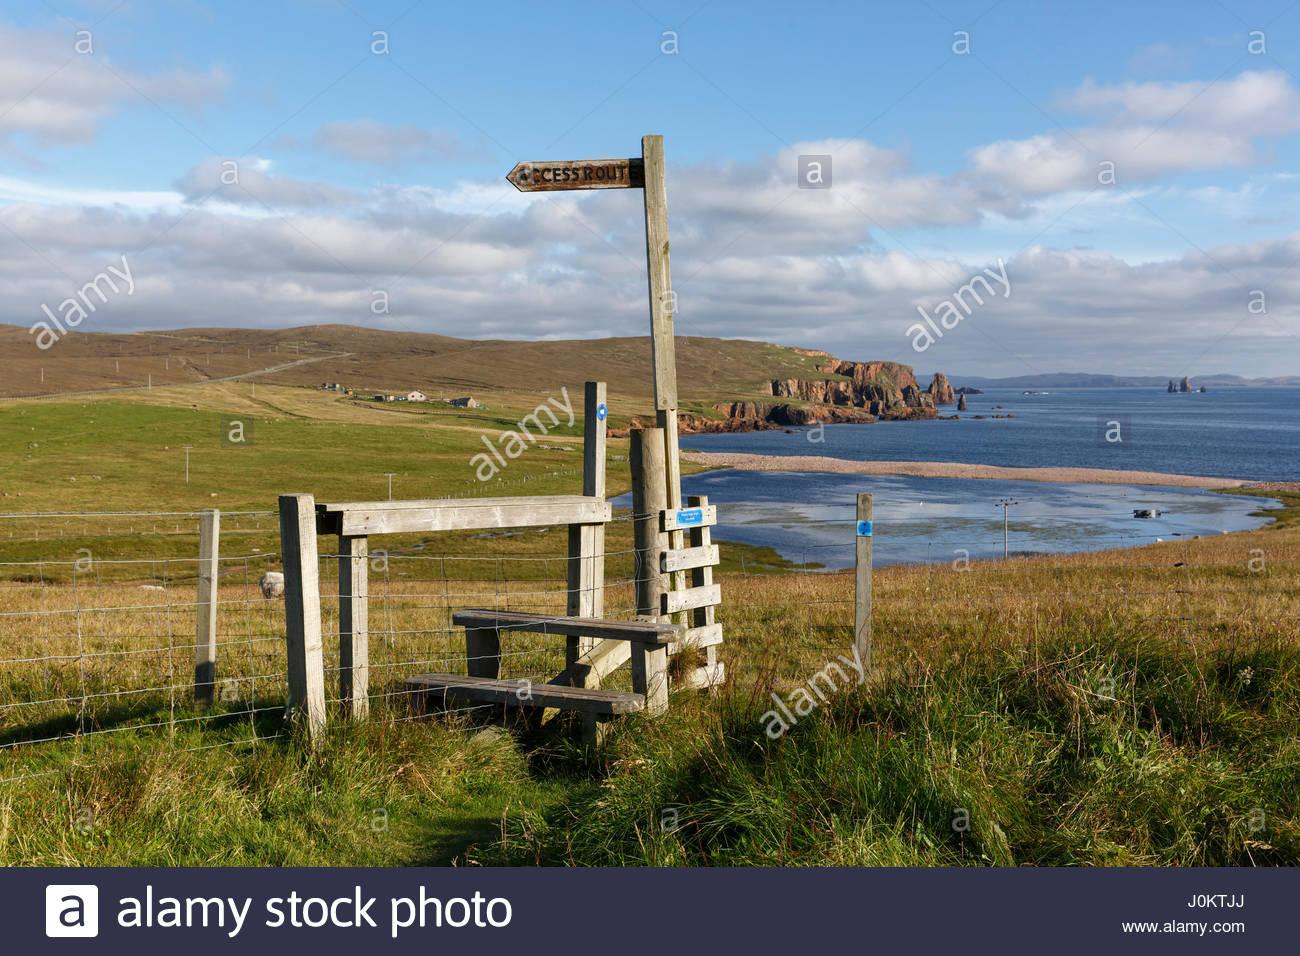 A stile and public access route near Braewick, Northmavine, Mainland, Shetland Islands, Scotland - Stock Image